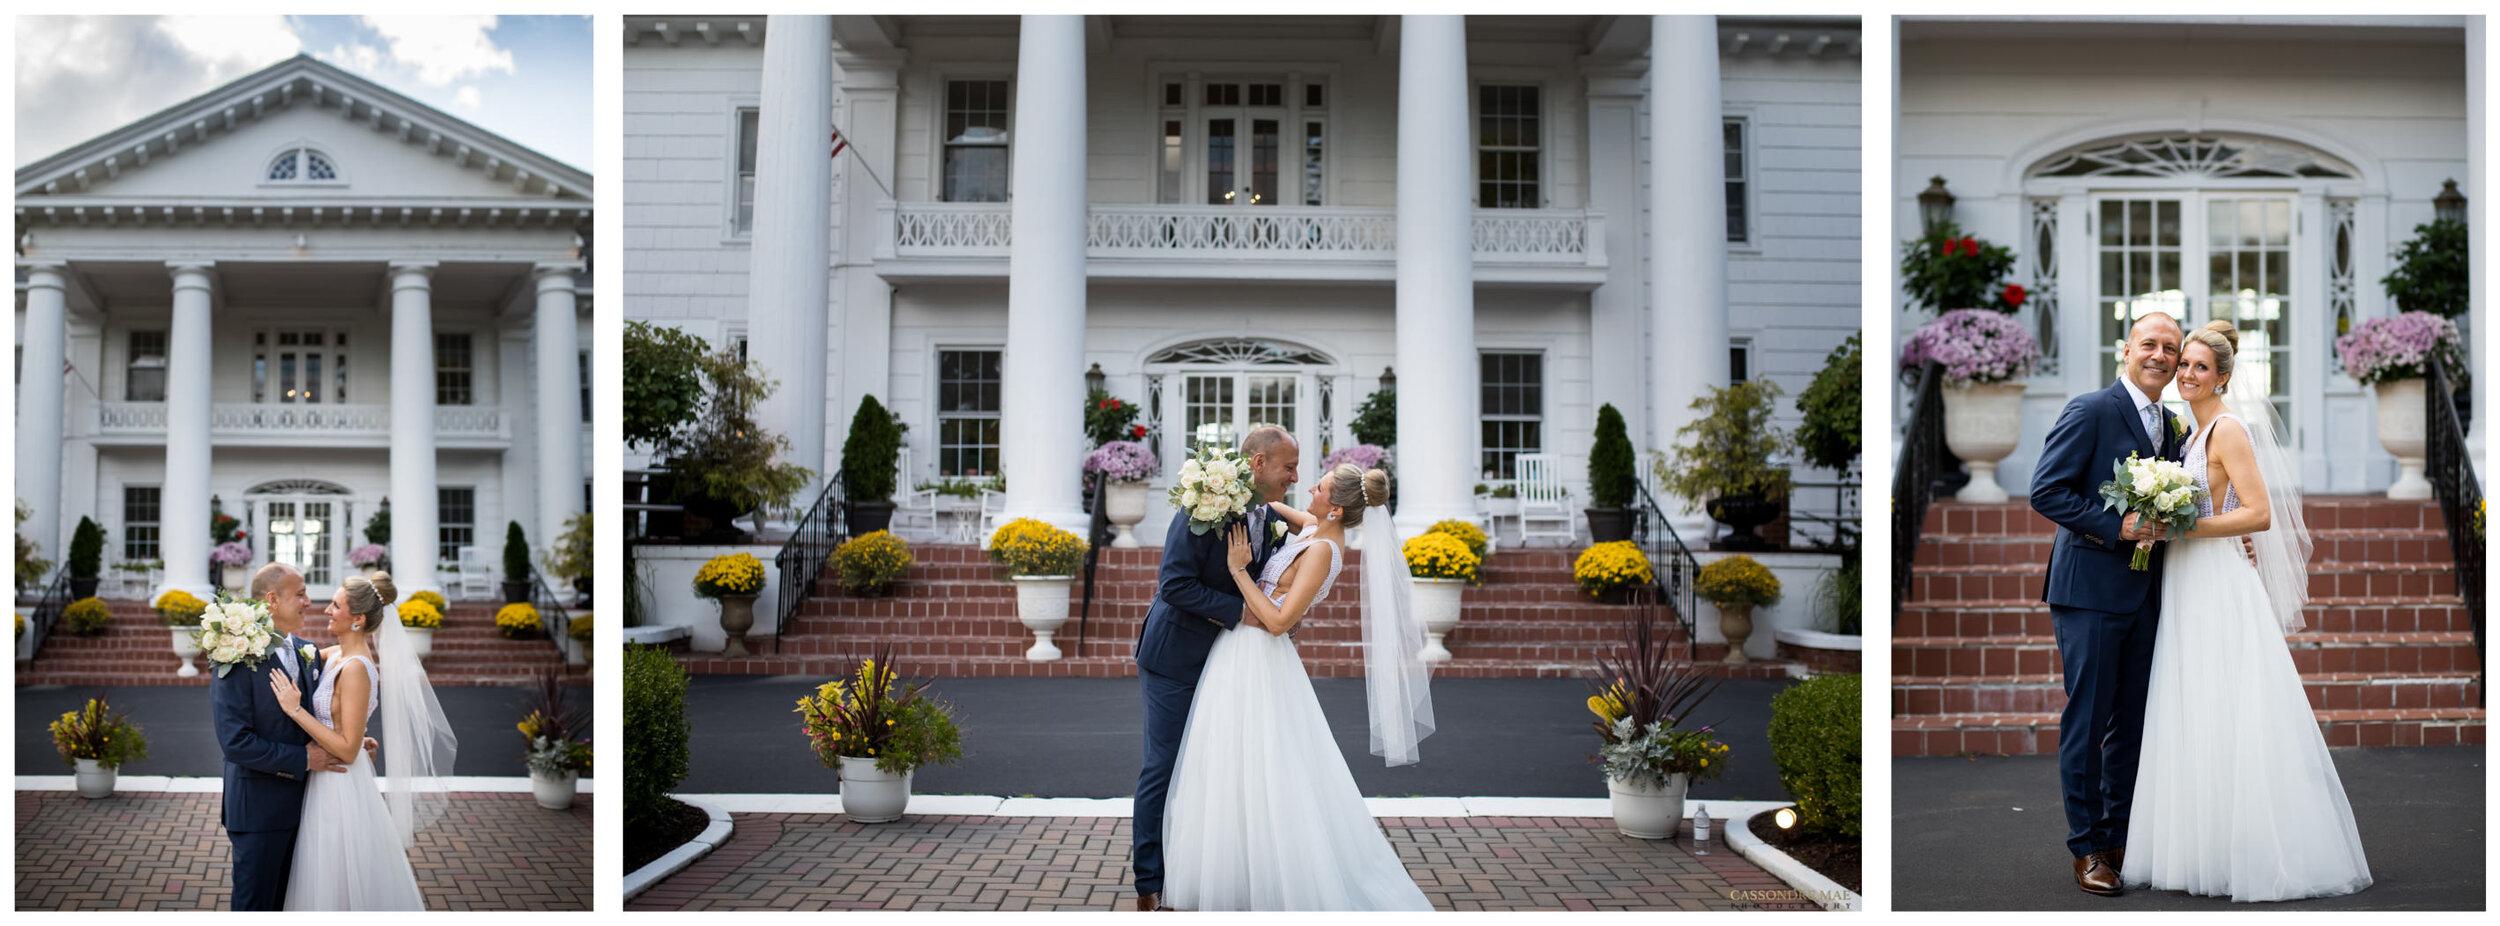 Cassondre Mae Photography Briarcliff Manor Wedding Photographer 24.jpg